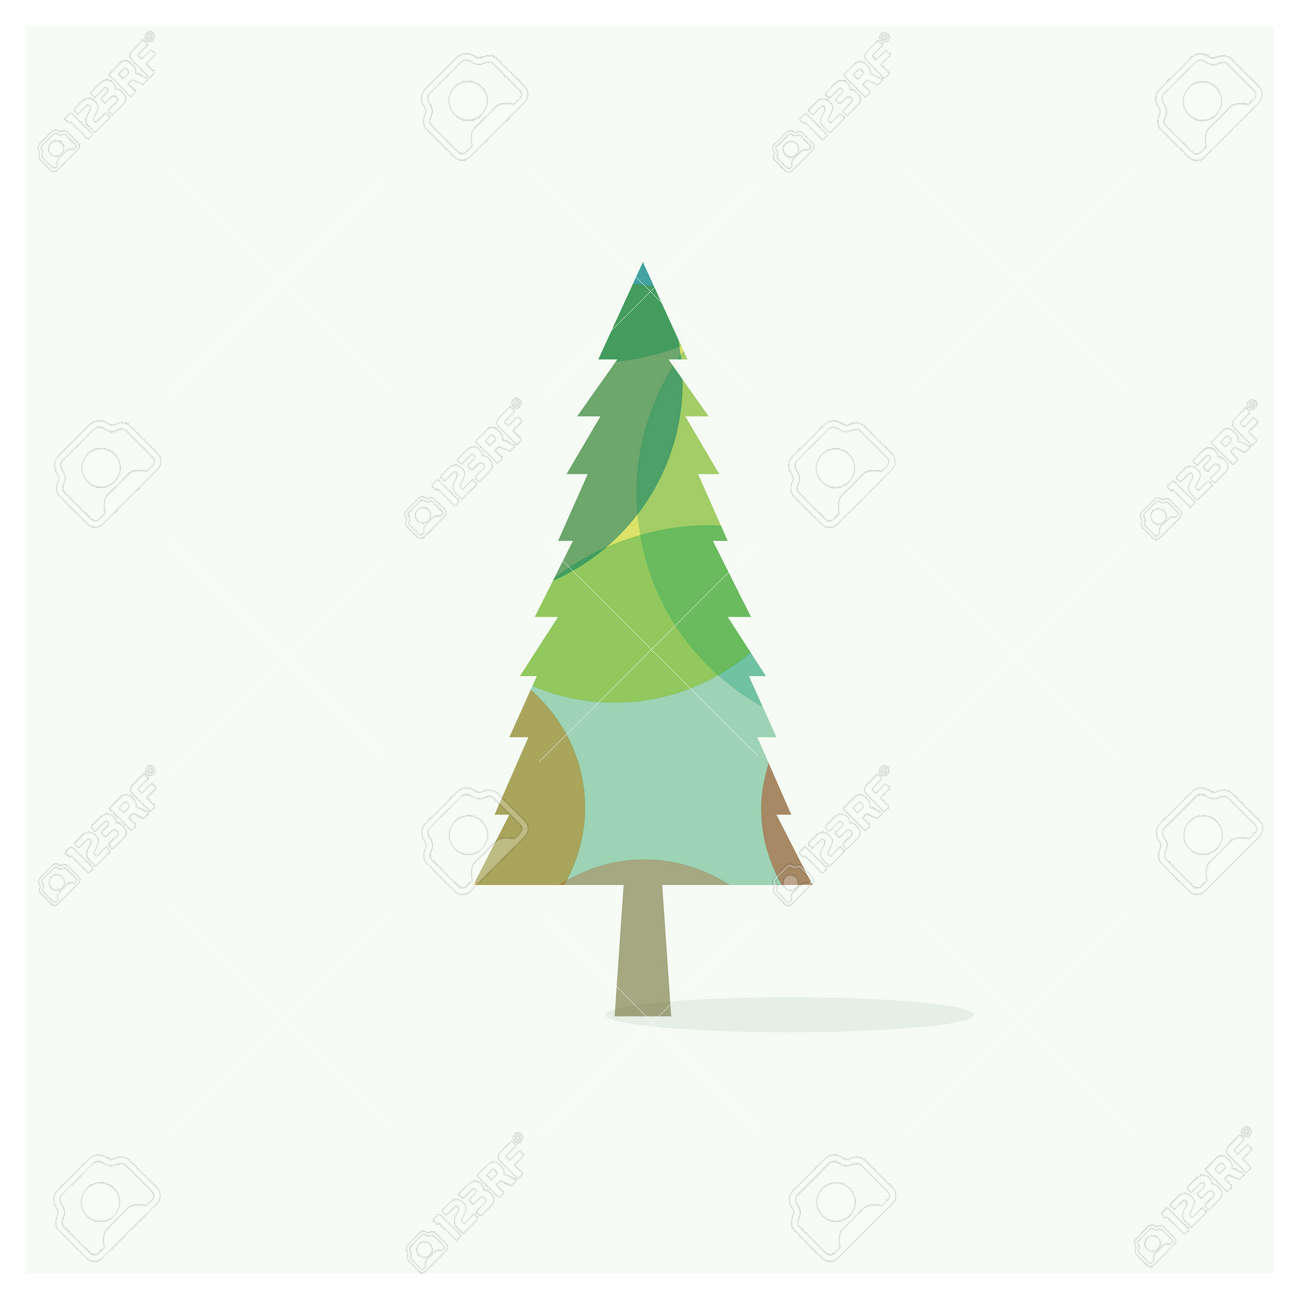 Colorful Christmas Tree Vector.Christmas Tree Vector Icon Beautiful And Colorful Tree Logo